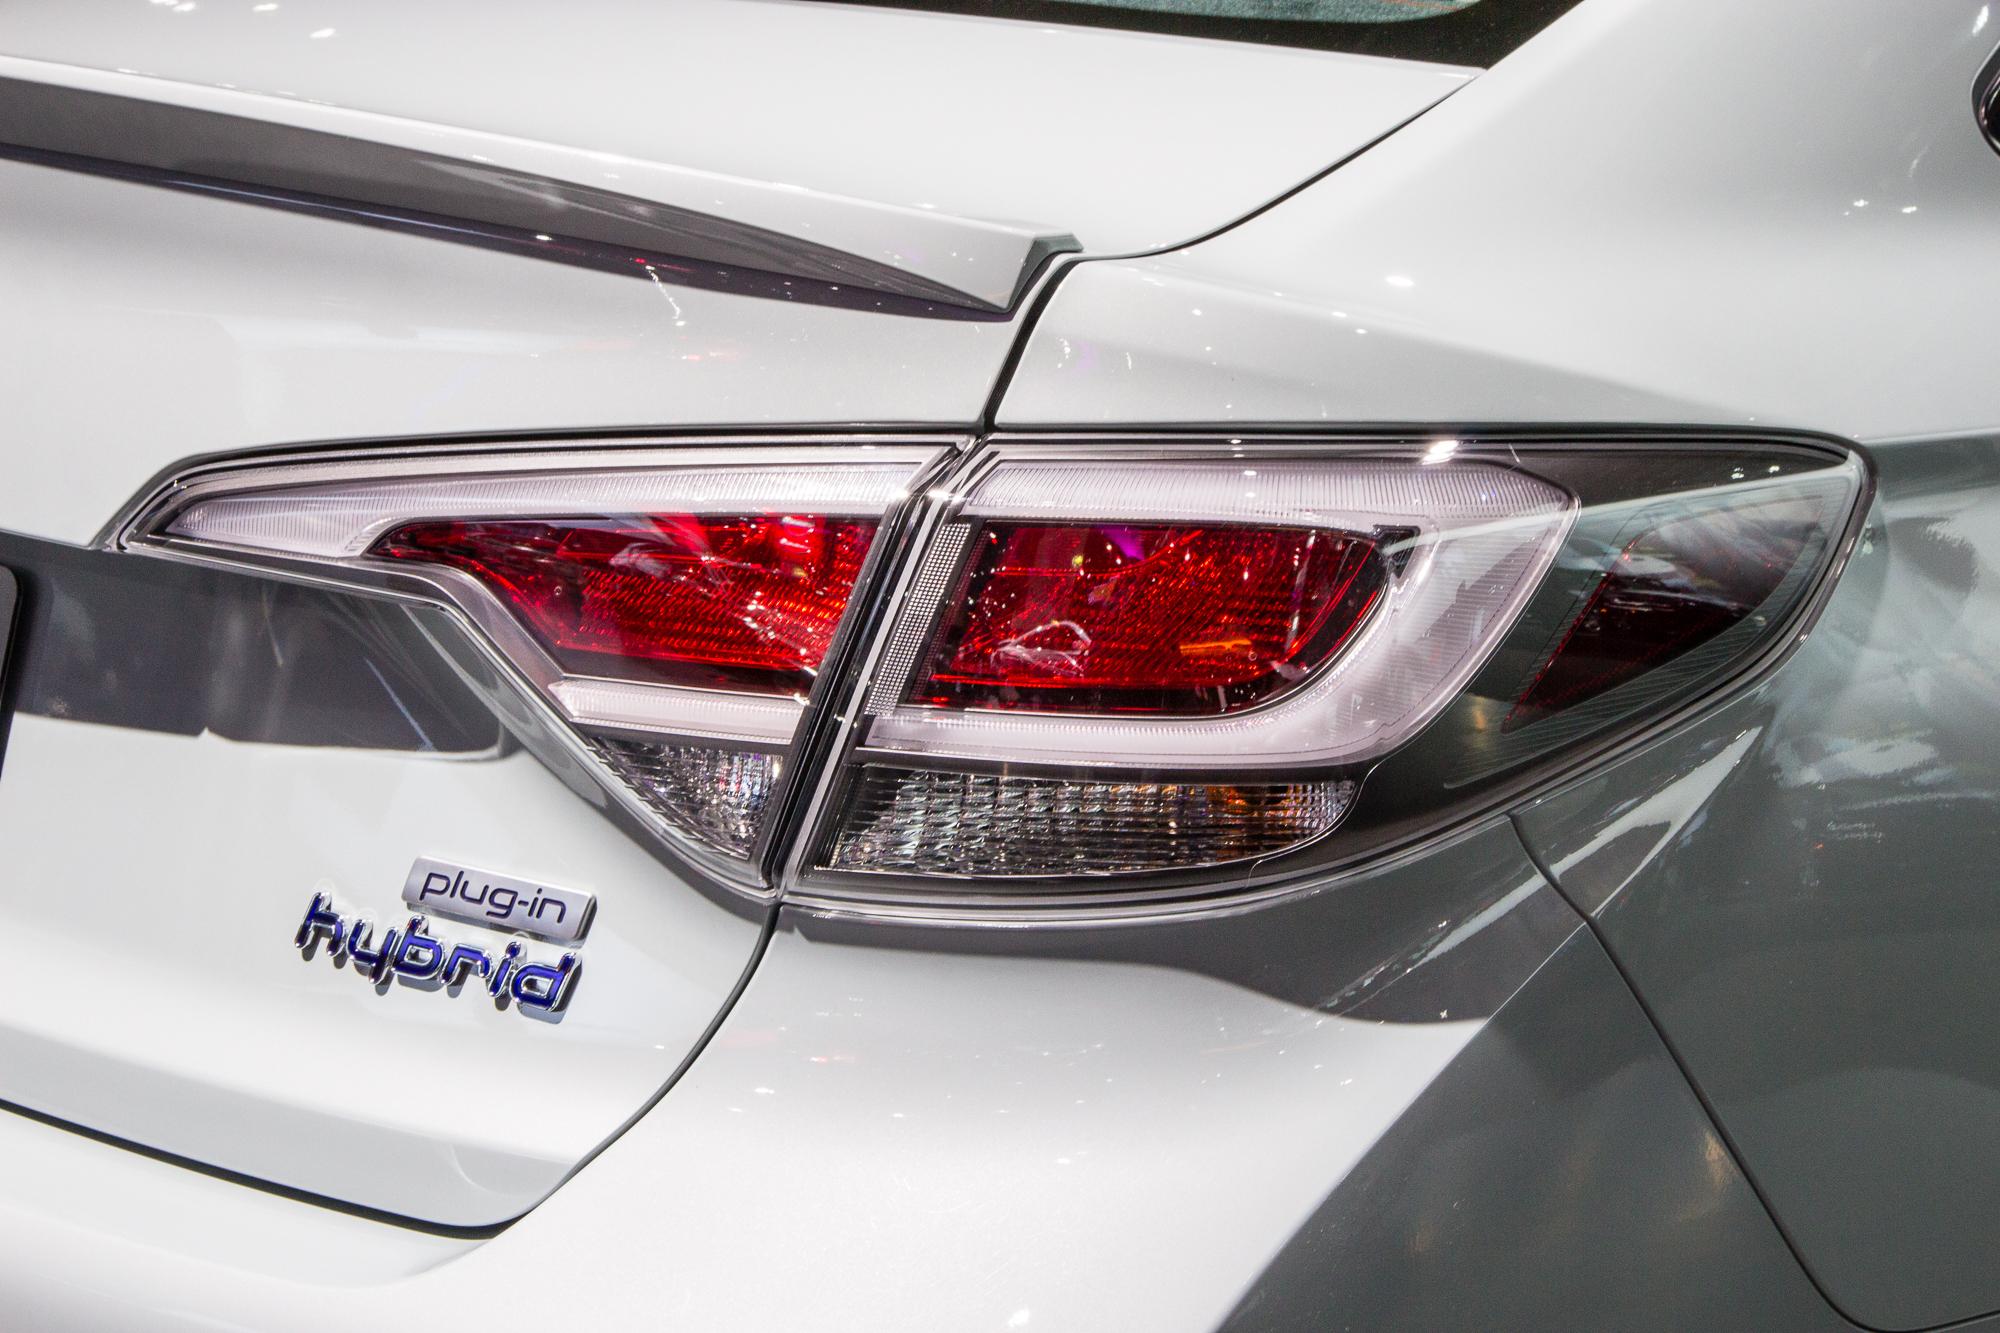 chevrolet bolt  tesla  honda electric car  hyundai sonata hybrid todays car news